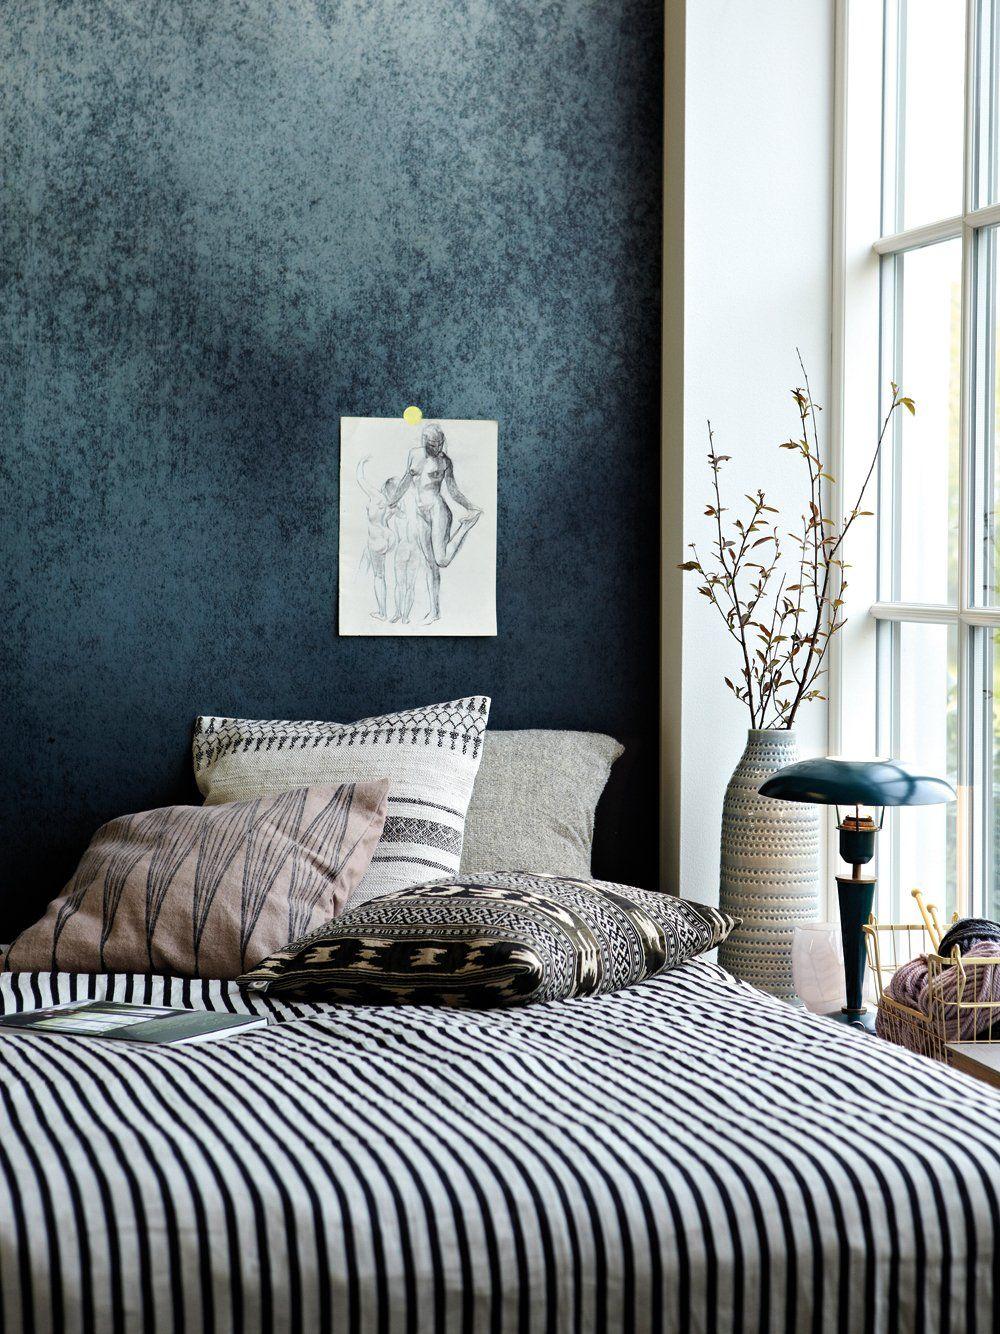 wohntrends 2017 bedroom pinterest besser gehen house doctor und ethno style. Black Bedroom Furniture Sets. Home Design Ideas